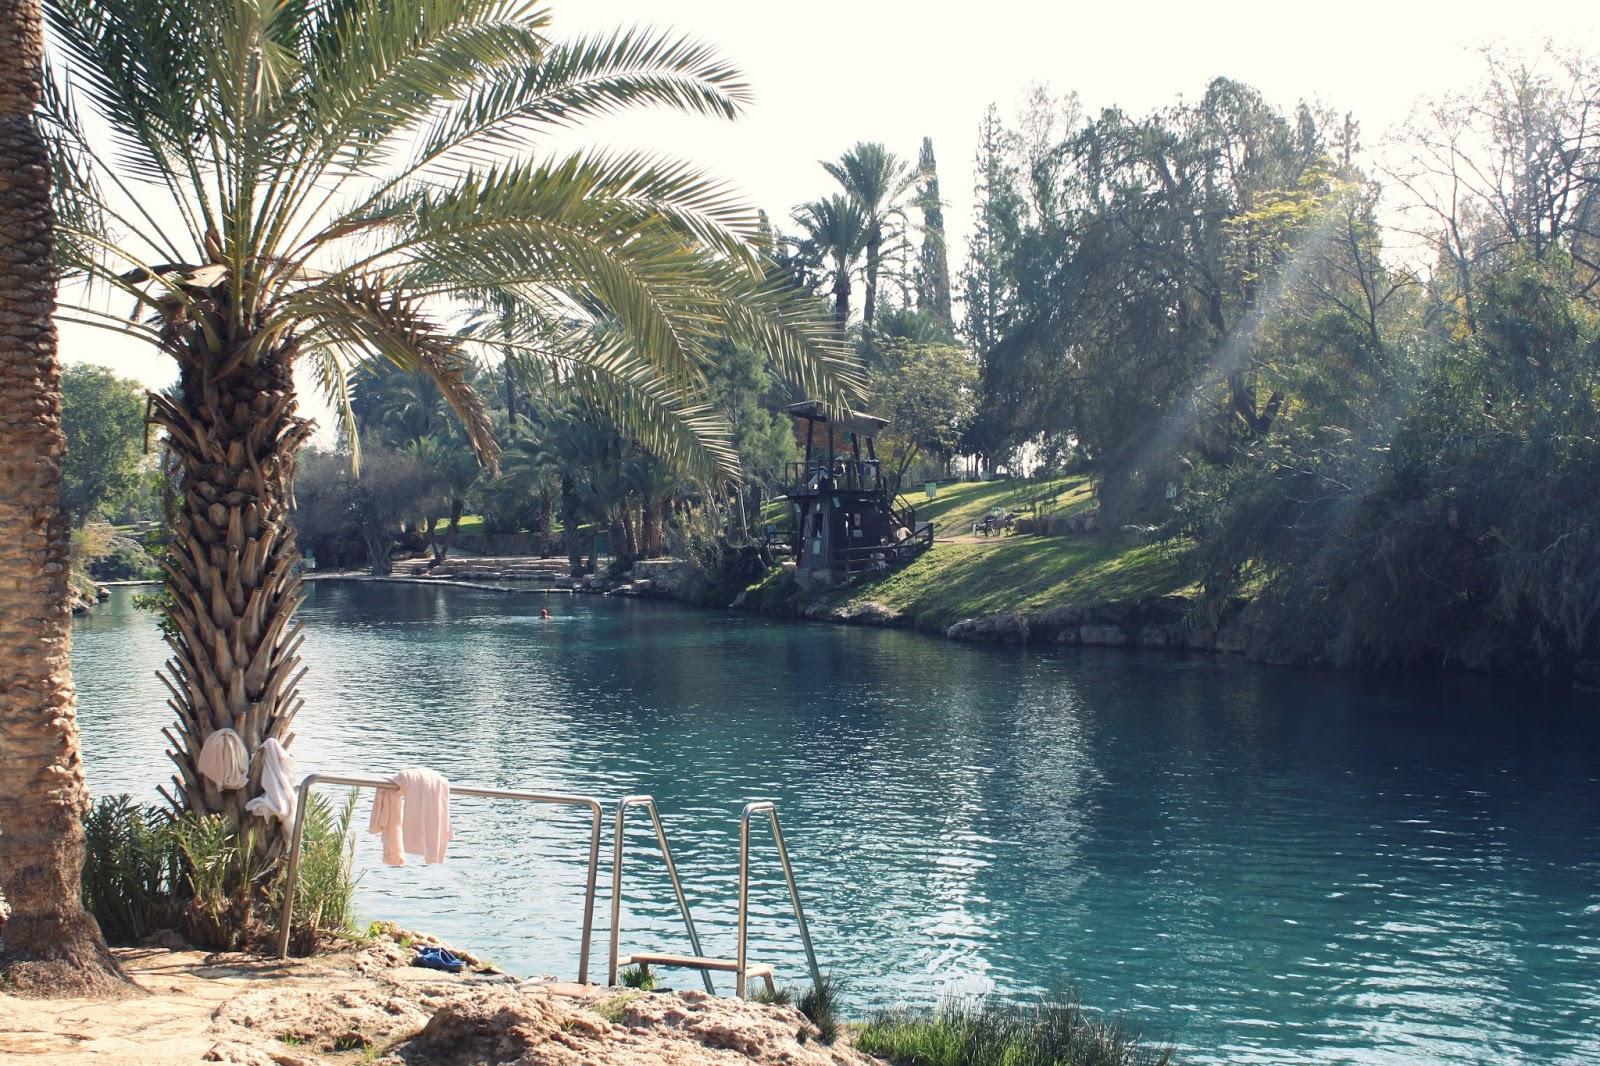 Israel Gan Hashlosha One Of The Most Beautiful Places In The World